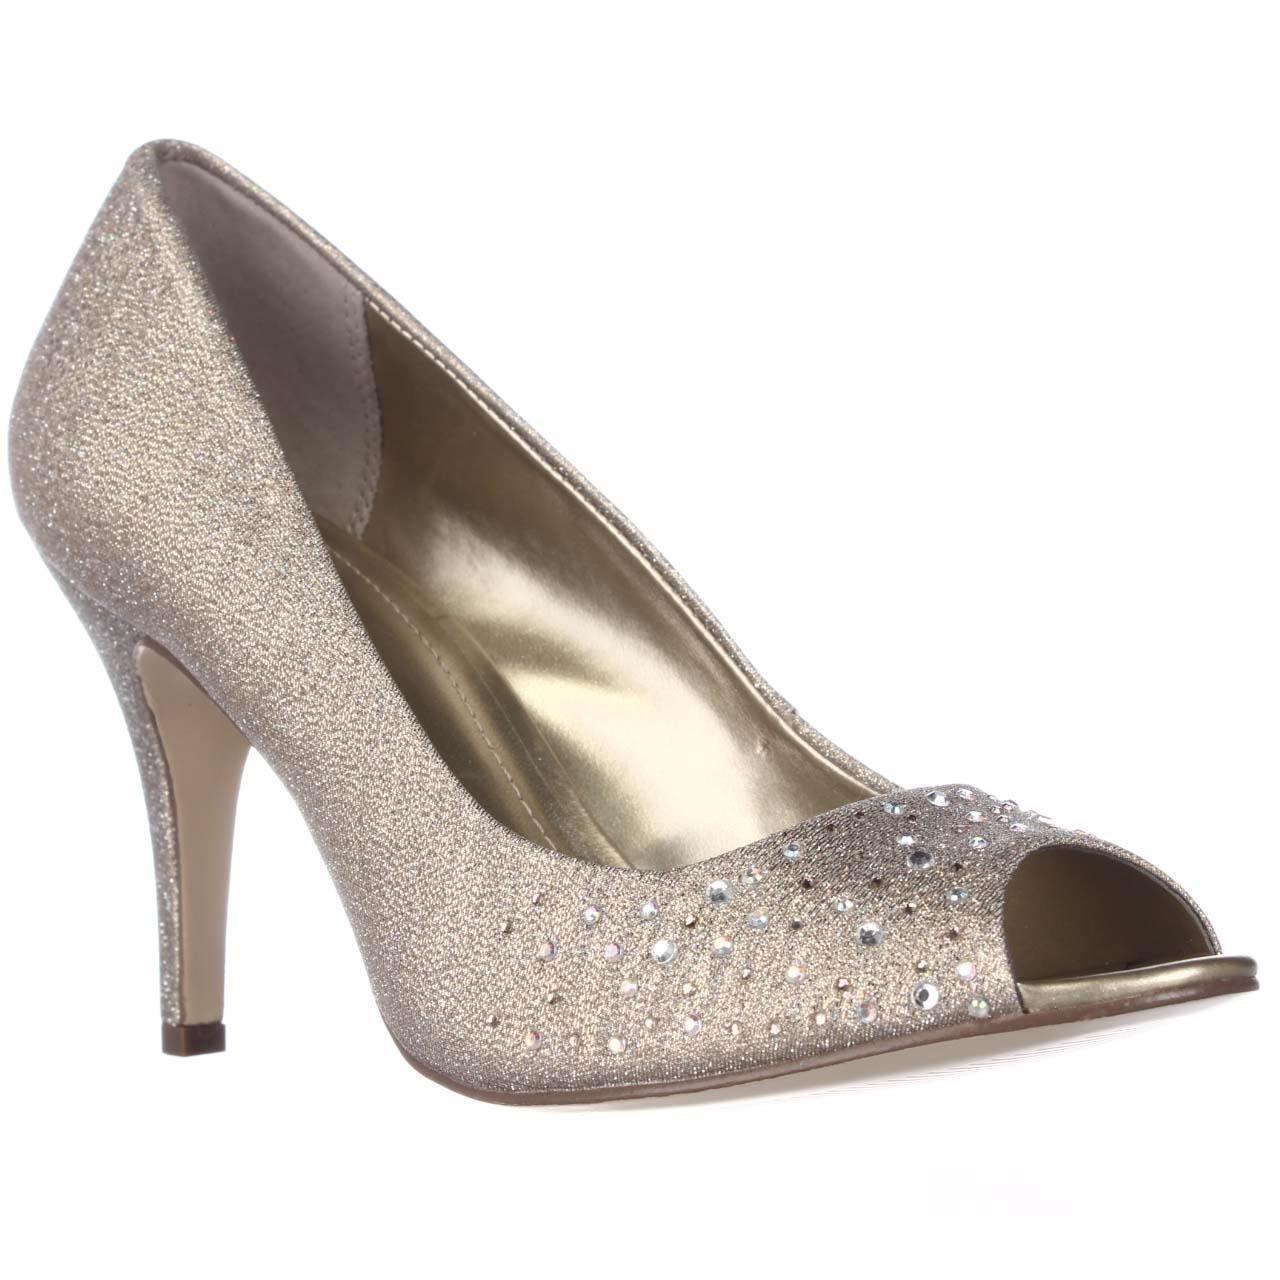 Style & Co. Womens Monaee Peep Toe Slingback Classic Pumps, Gold, Size 10.0